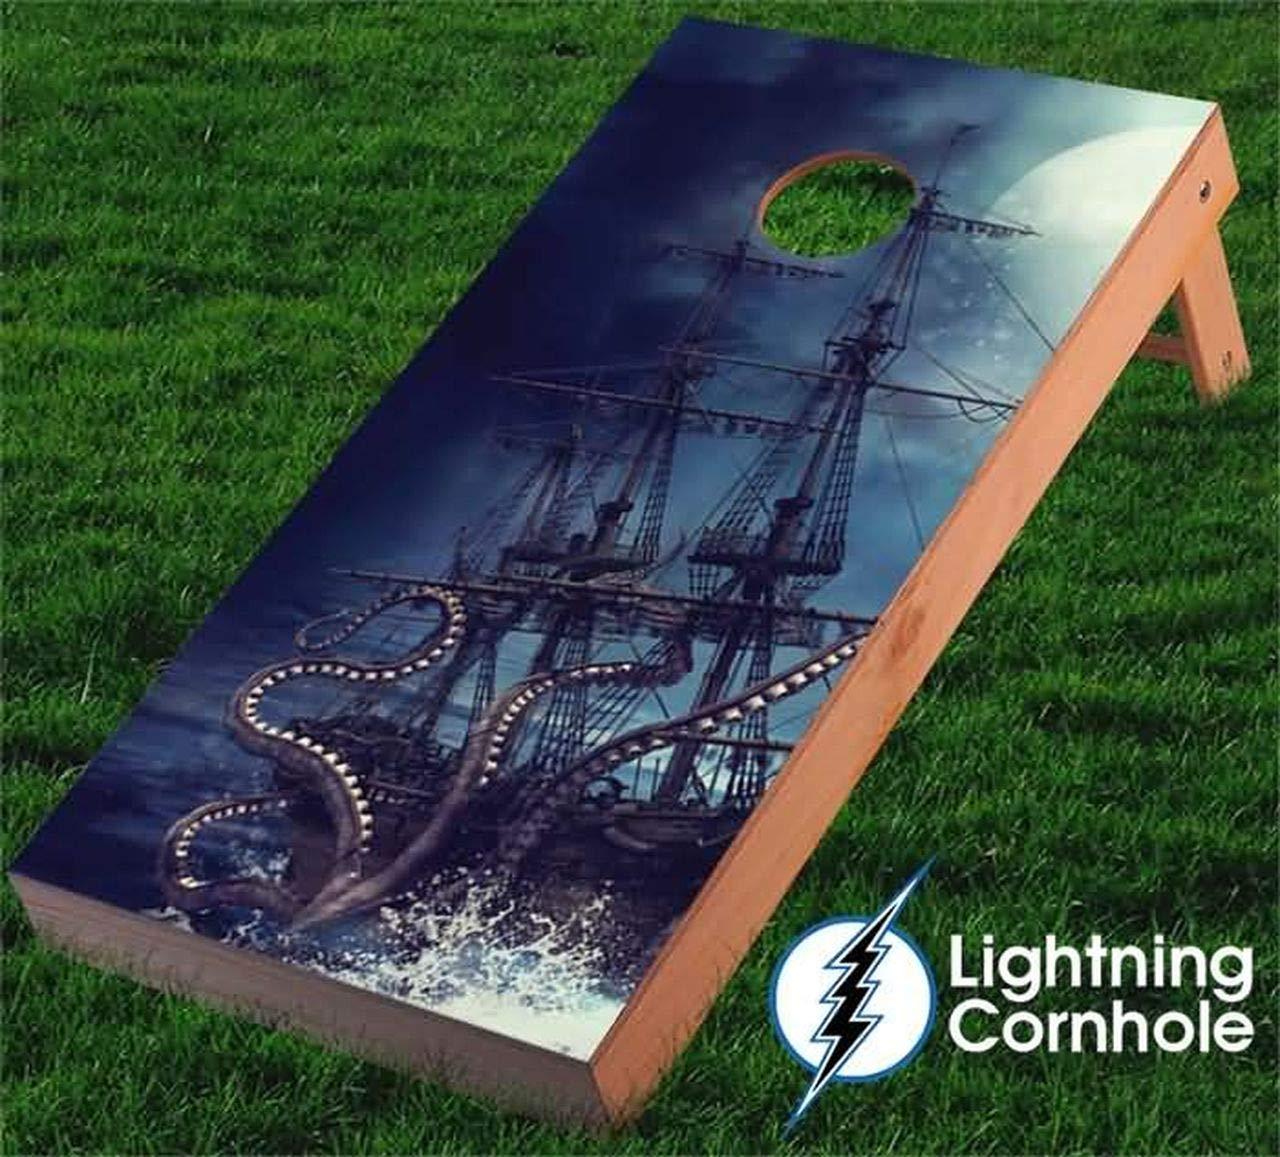 Kraken and Pirate Ship Cornhole Boards